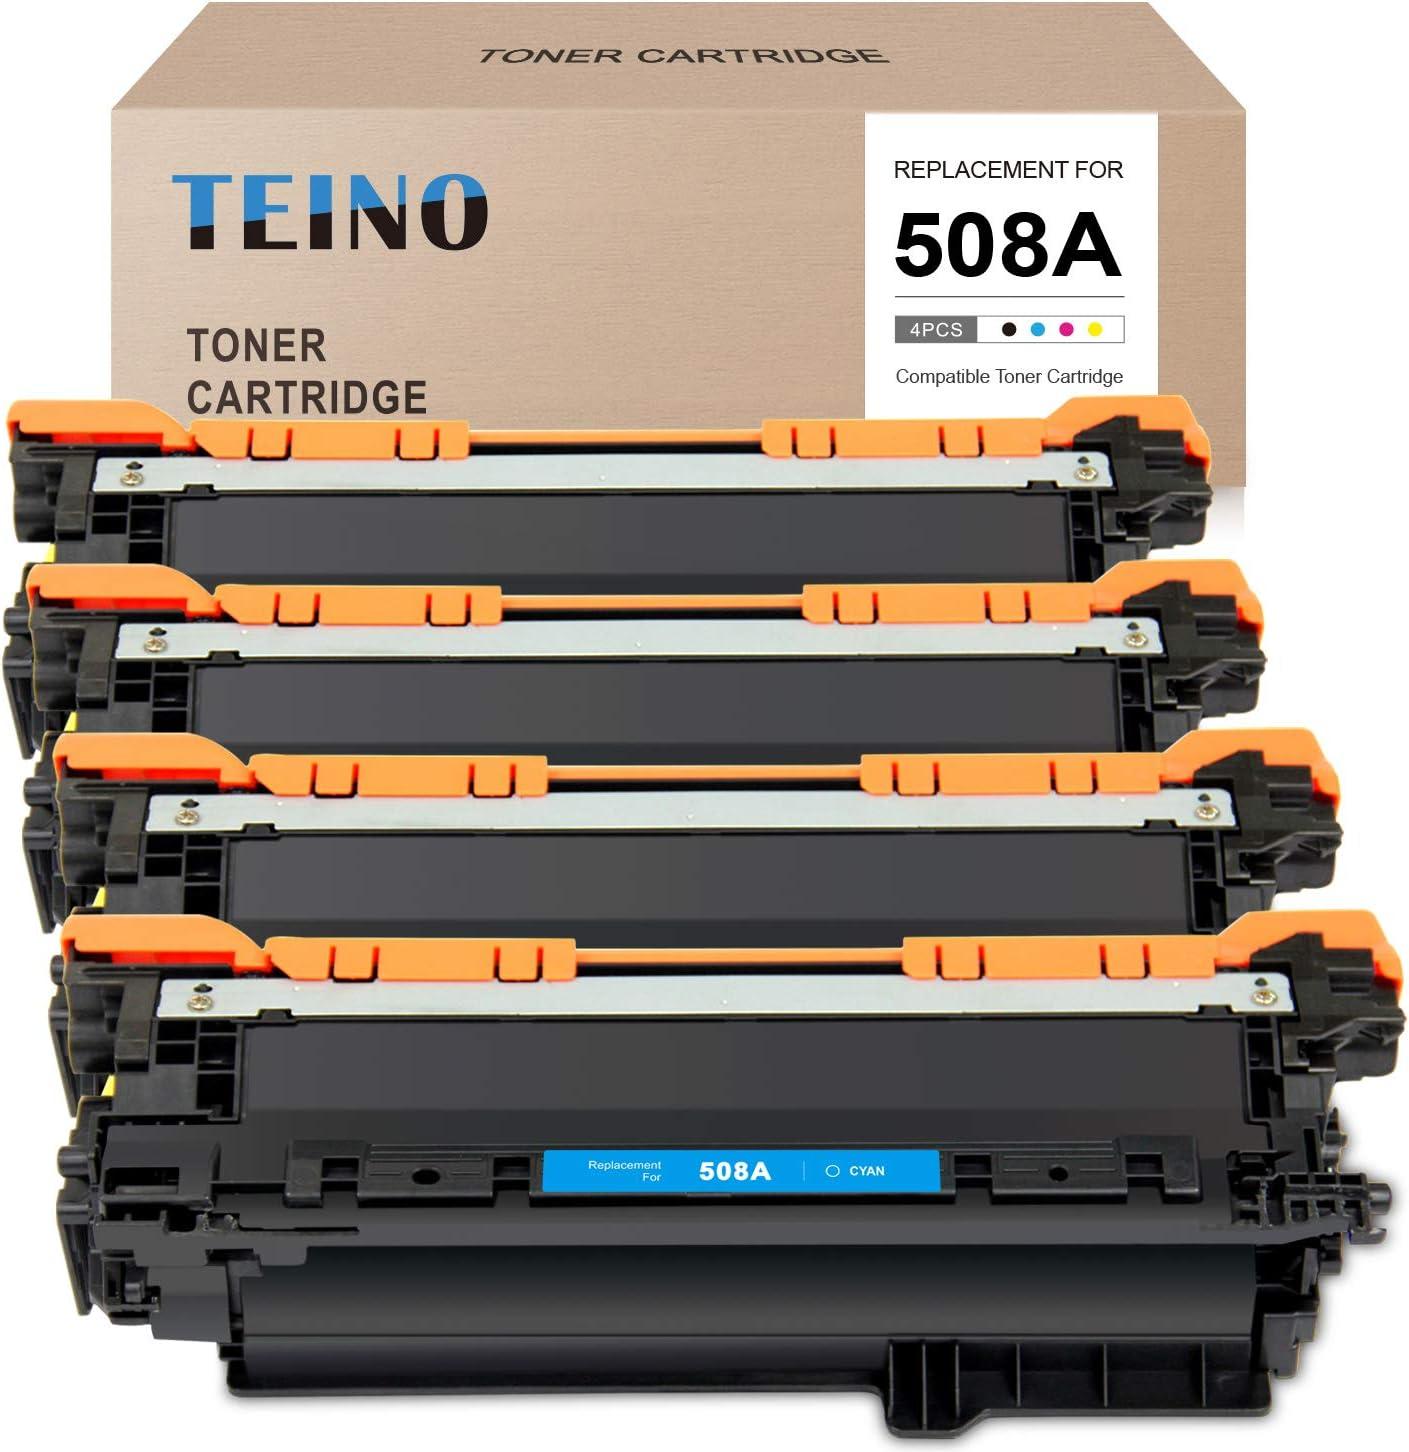 TEINO Compatible Toner Cartridge Replacement for HP 508A CF360A CF361A CF362A CF363A use with HP Color Laserjet Enterpris M552dn M553 M553n M553dn M553x M577dn (Black, Cyan, Magenta, Yellow, 4-Pack)